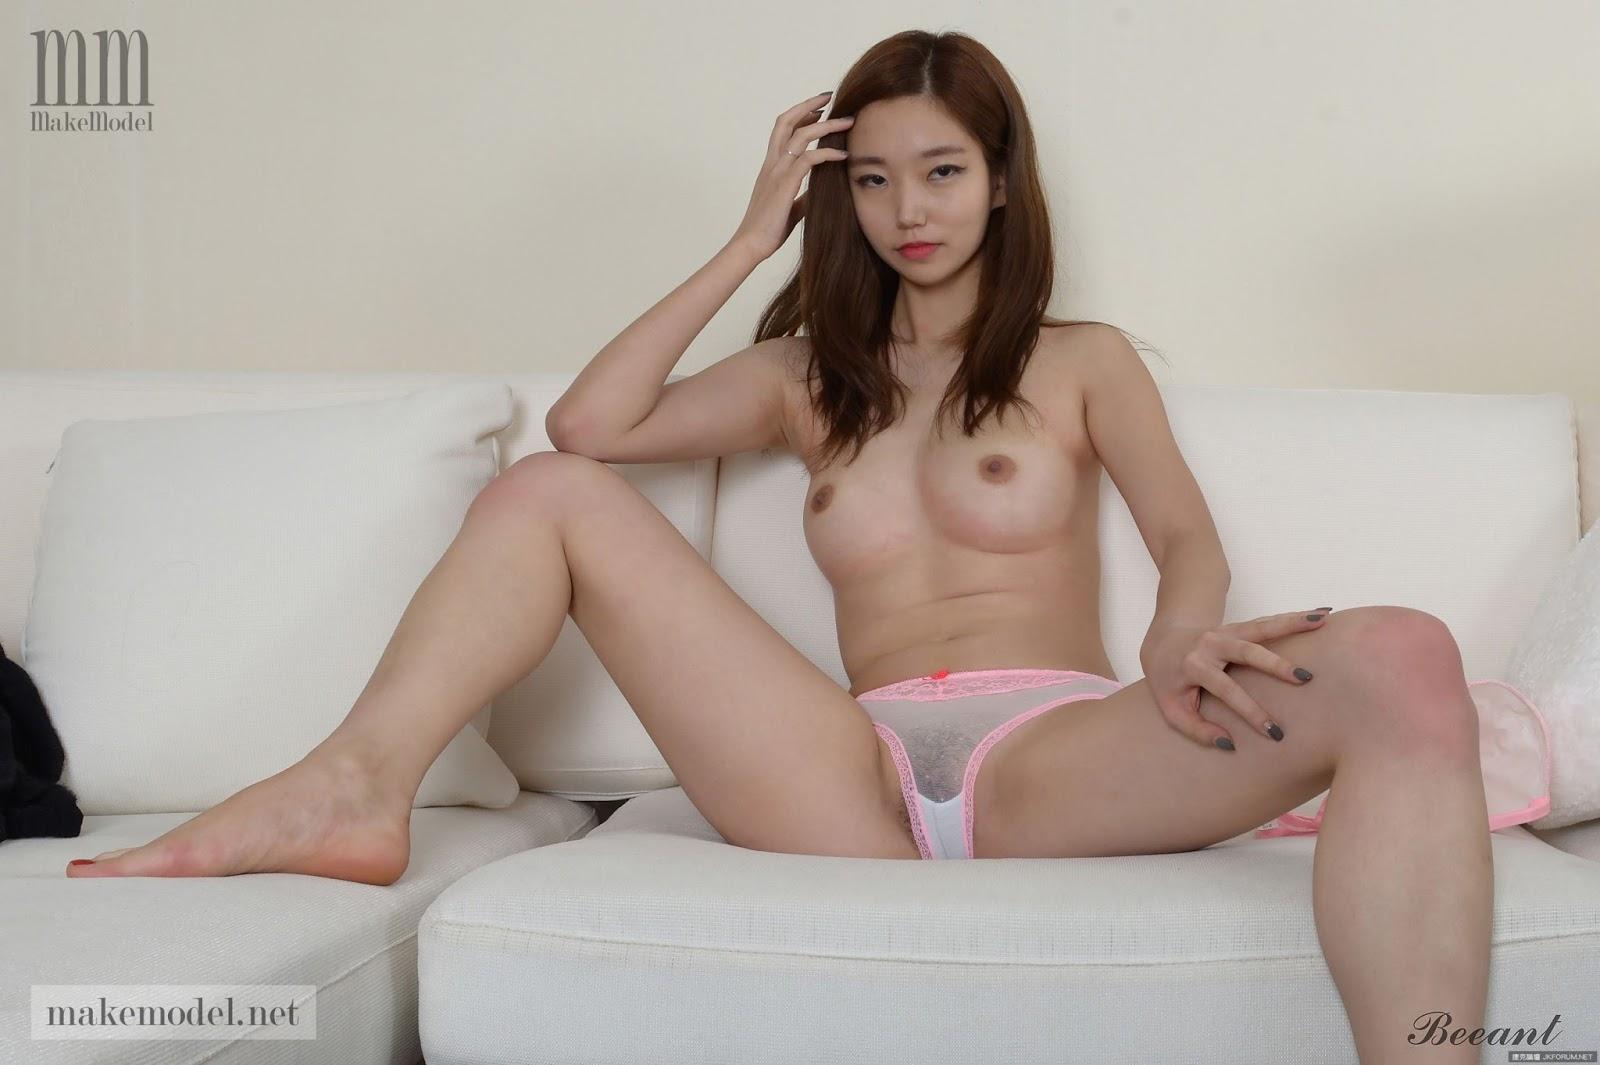 270912 3457 - Korean Nude - Big Albom Remain #A-korean girl